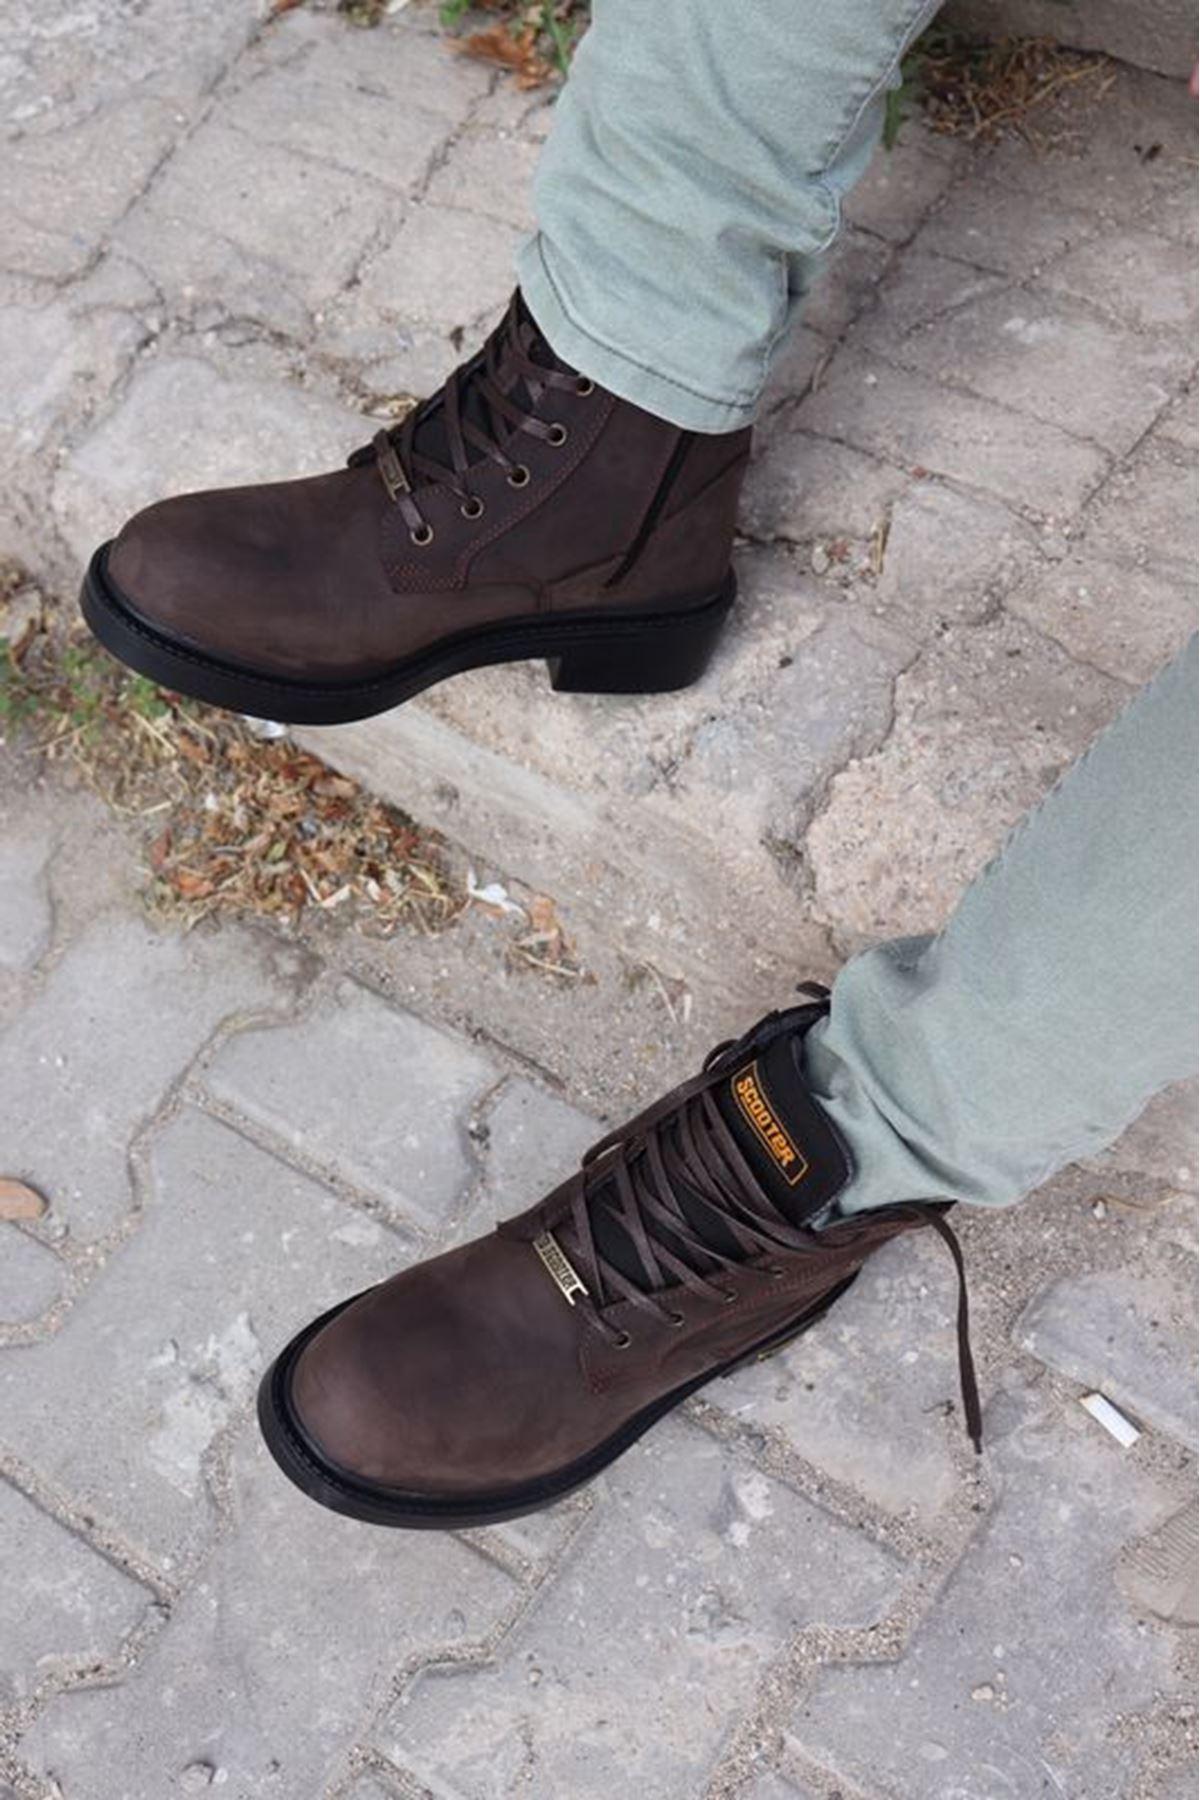 SCOOTER- M5121CKO- KAHVERENGİ ERKEK BOT